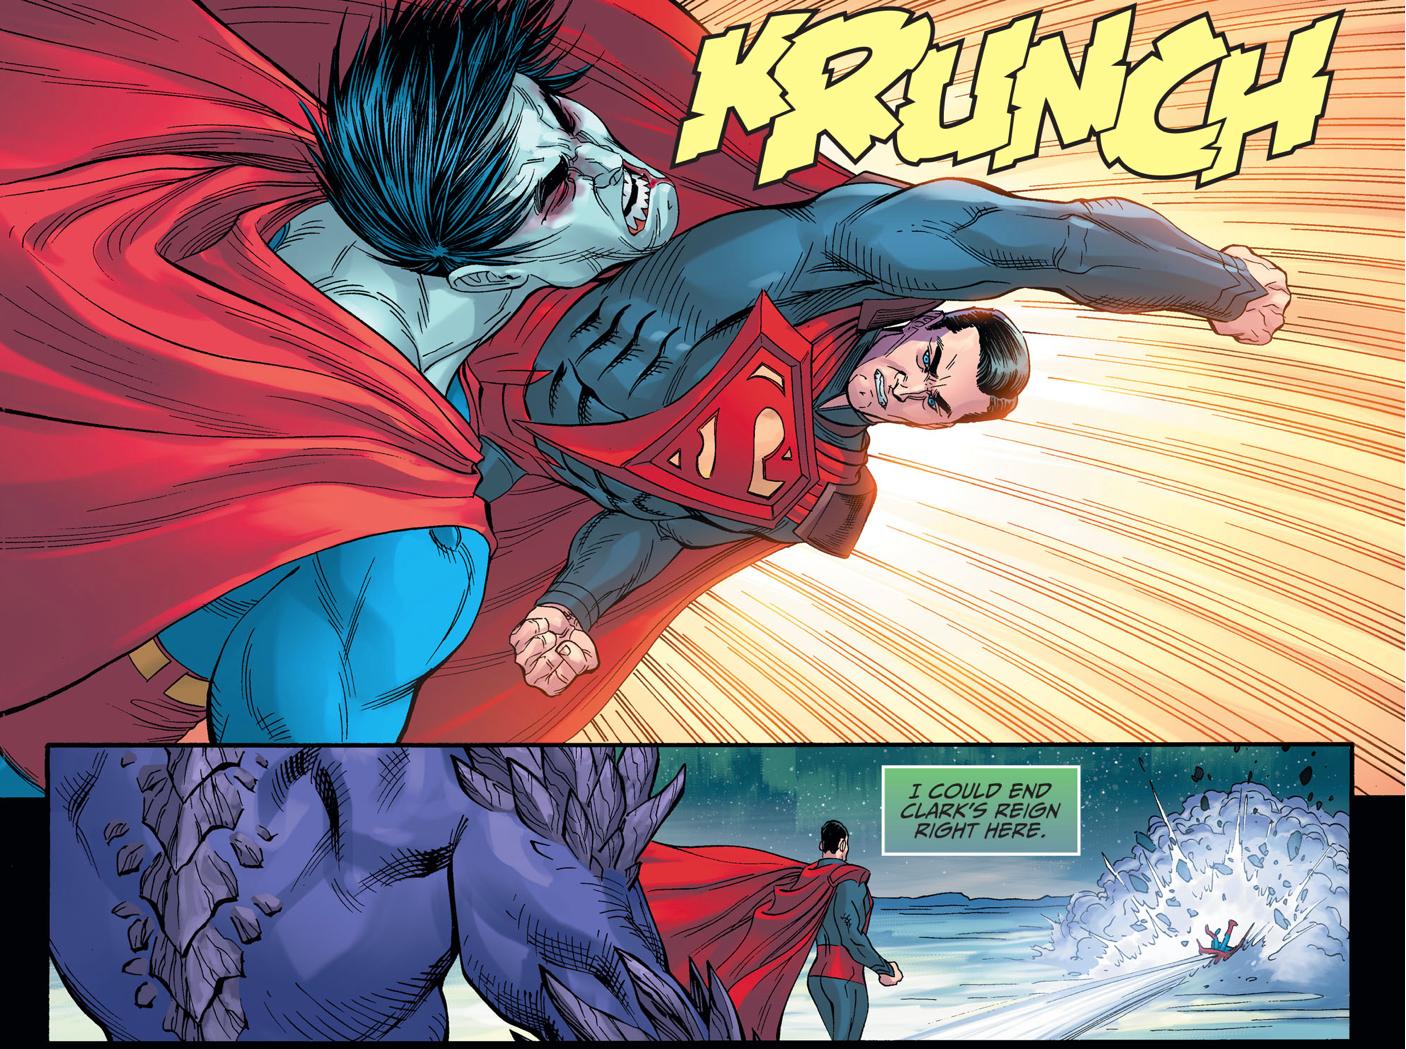 Bizarro And Doomsday VS Superman (Injustice Gods Among Us)